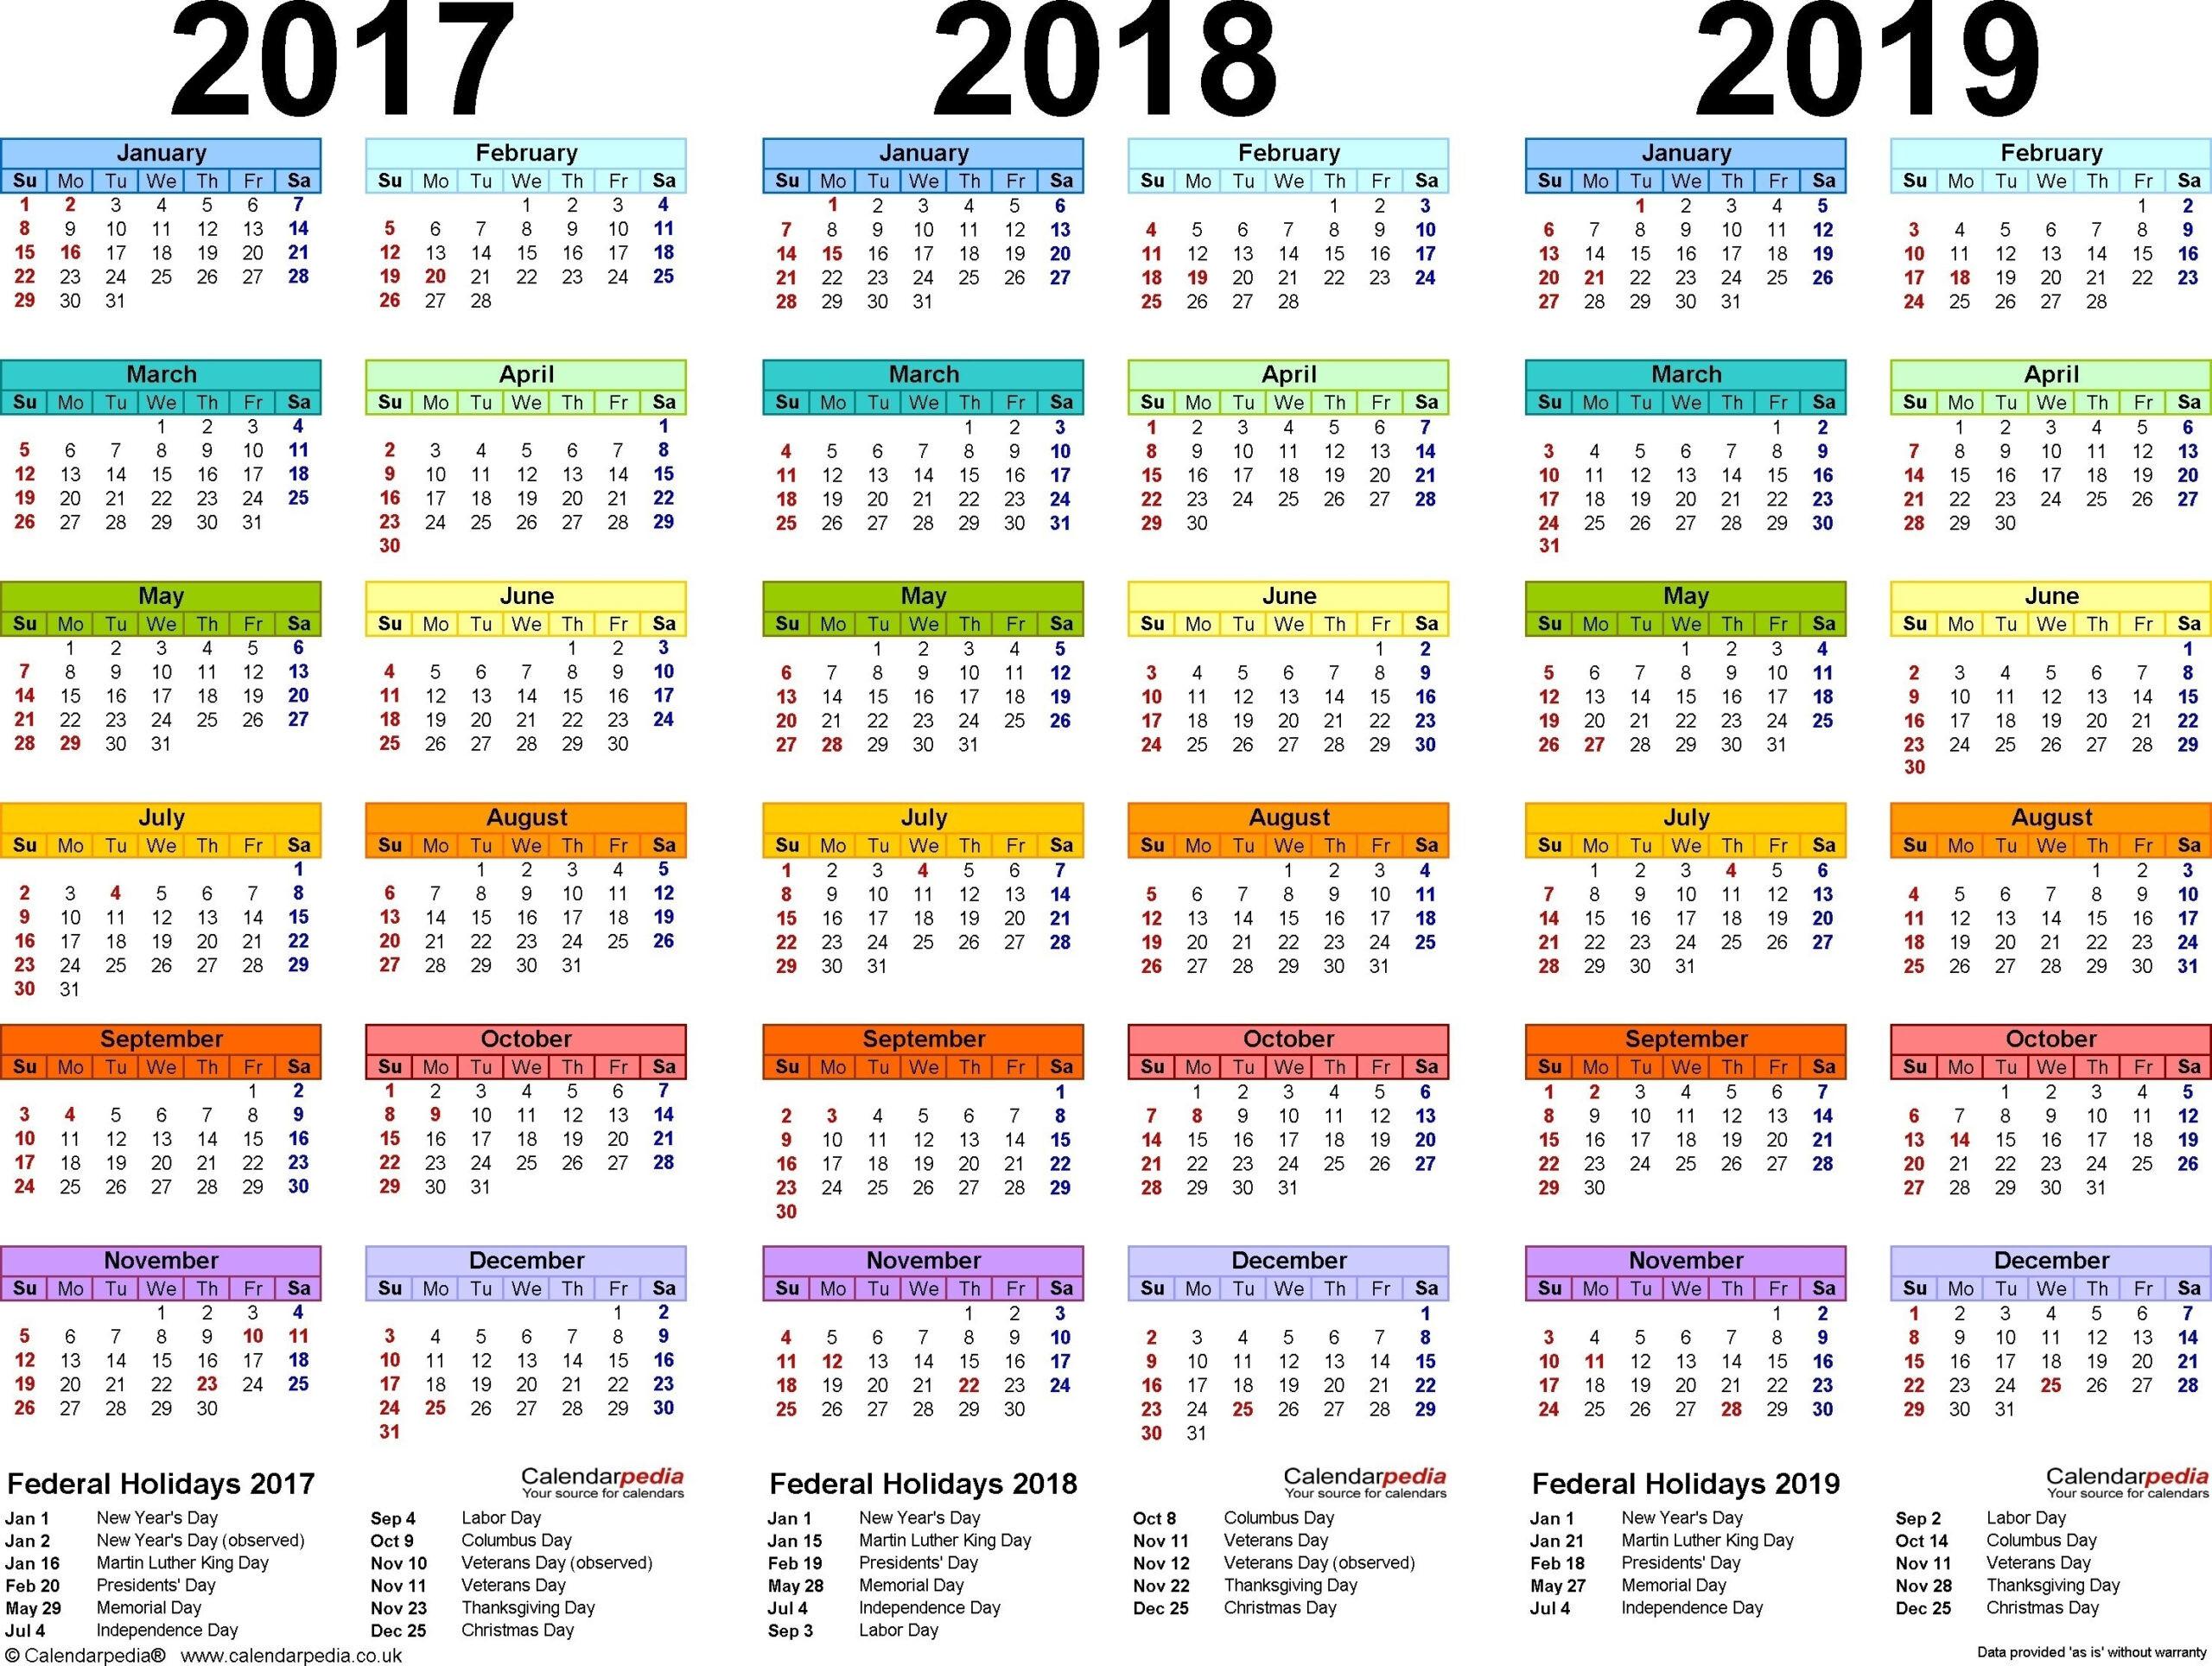 Depo Callendar 2021 | Calendar Printables Free Blank  Depo Provera Injection Schedule 2021